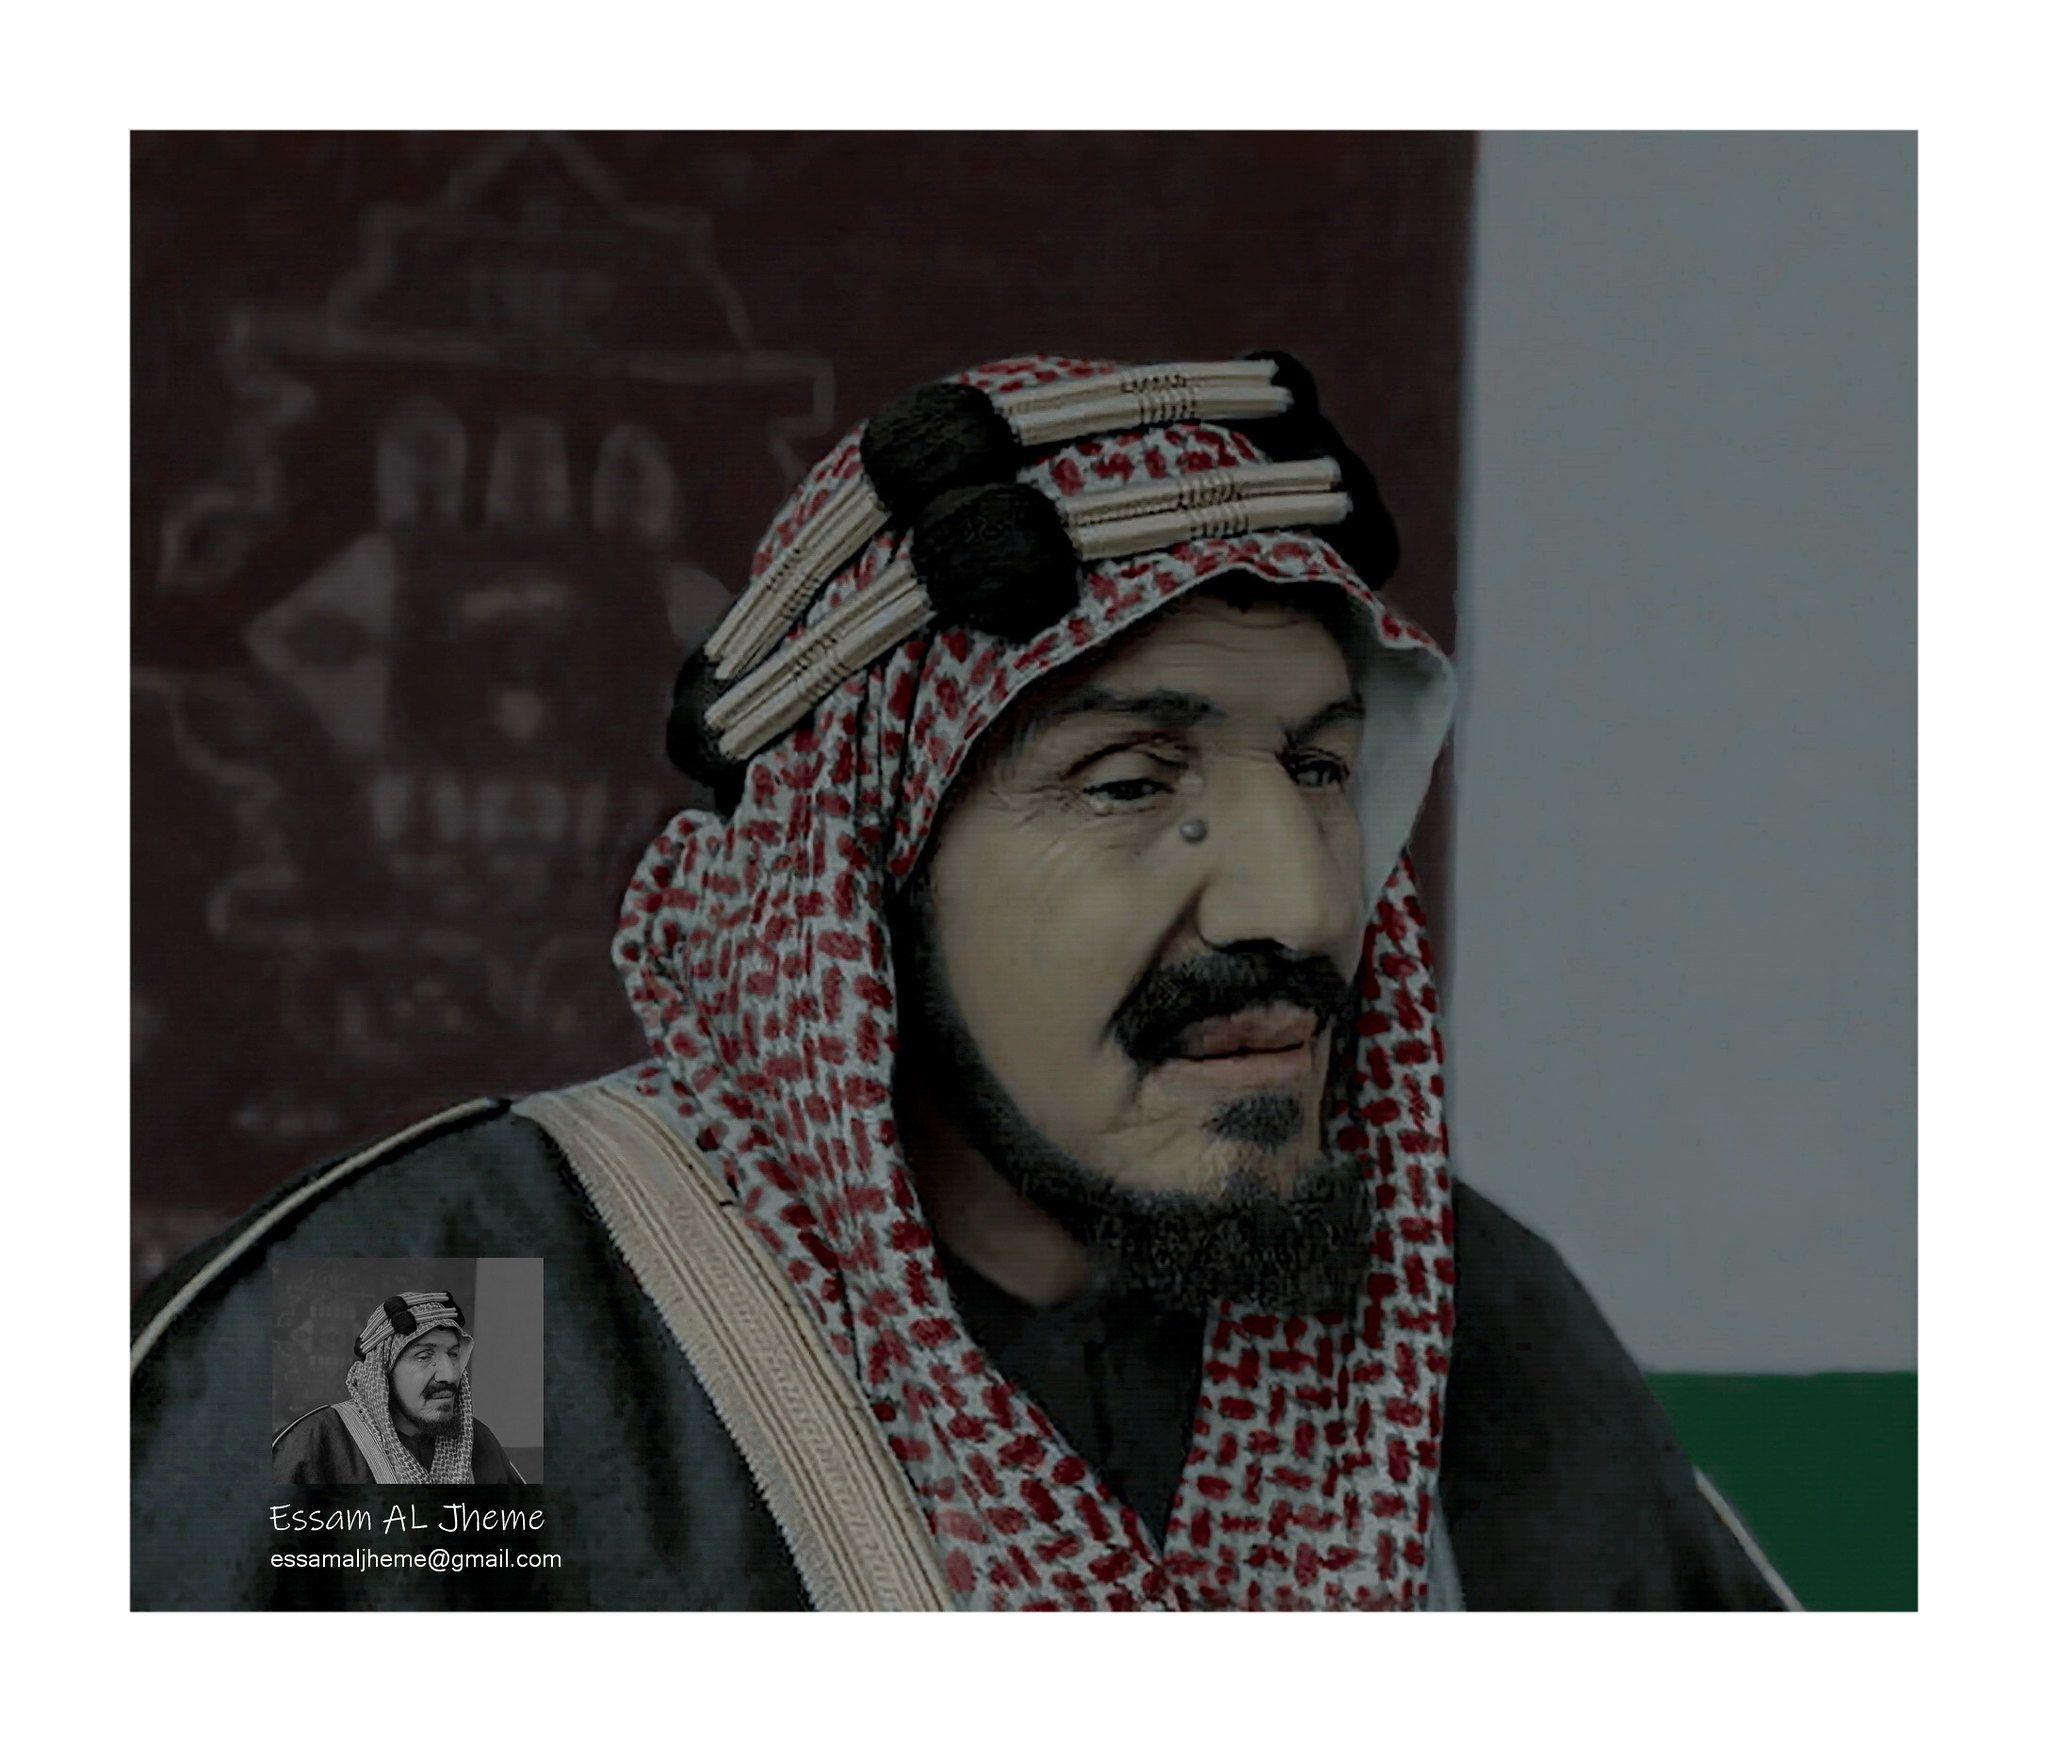 الملك عبدالعزيز بن عبدالرحمن آل سعود Rare Pictures My Images Image